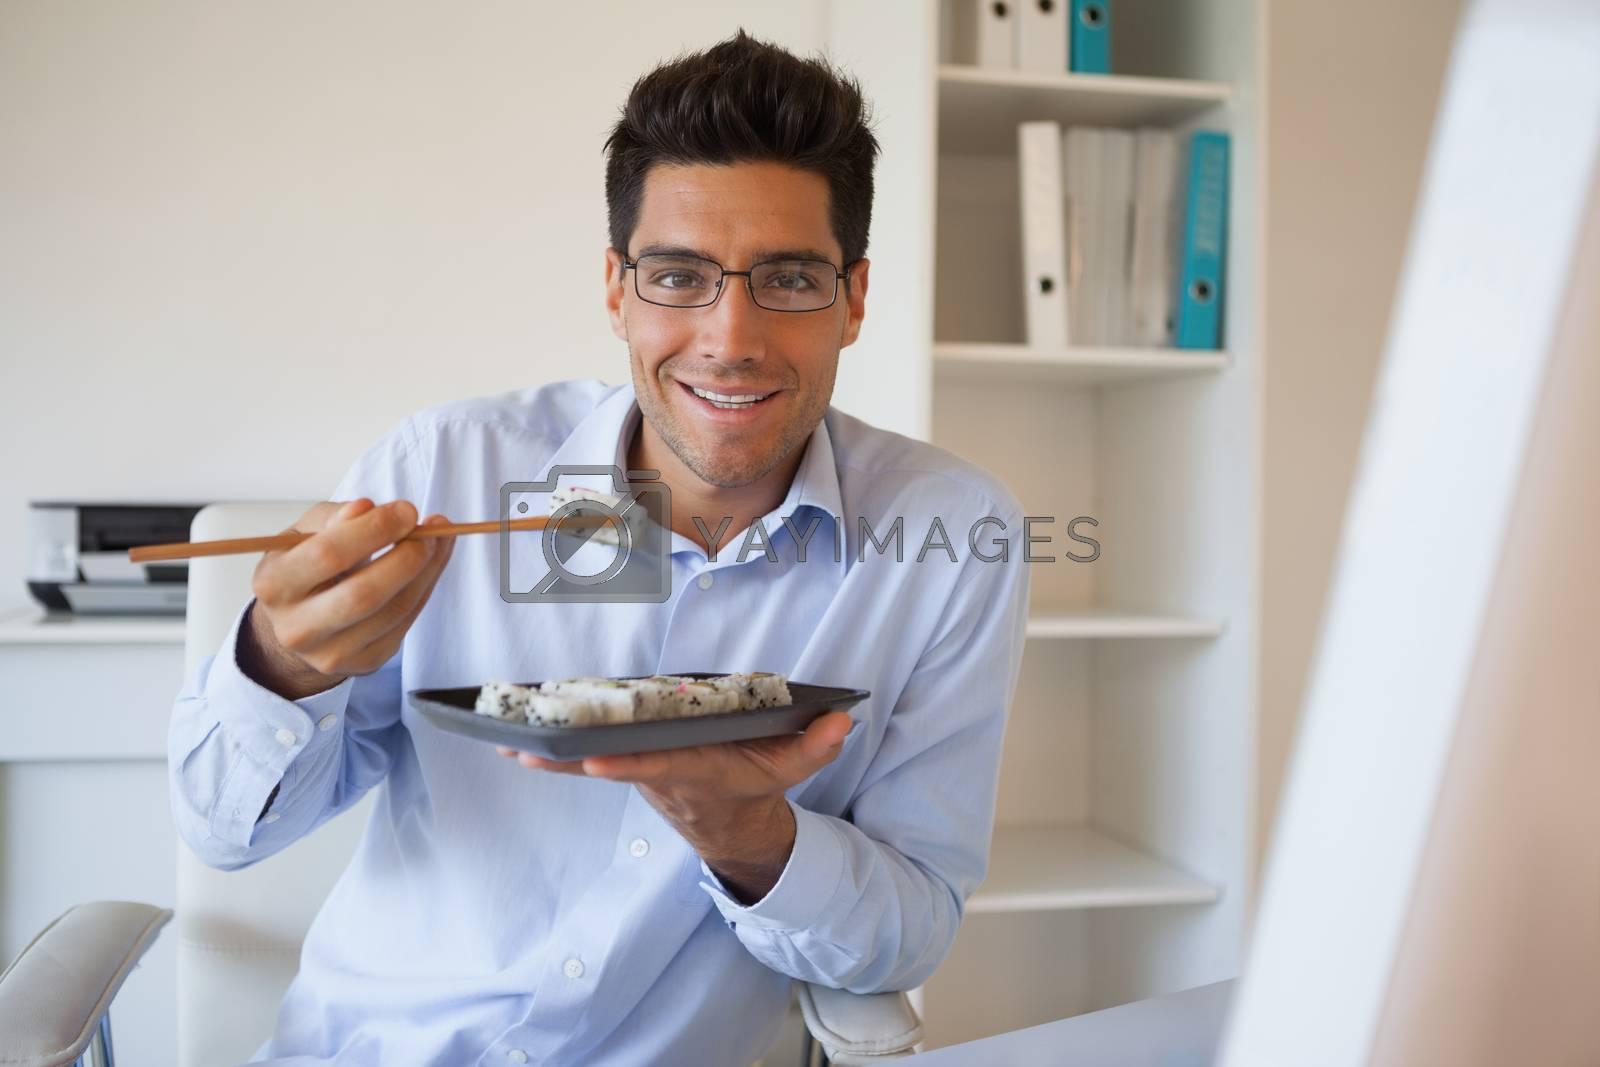 Royalty free image of Casual businessman enjoying sushi at his desk by Wavebreakmedia